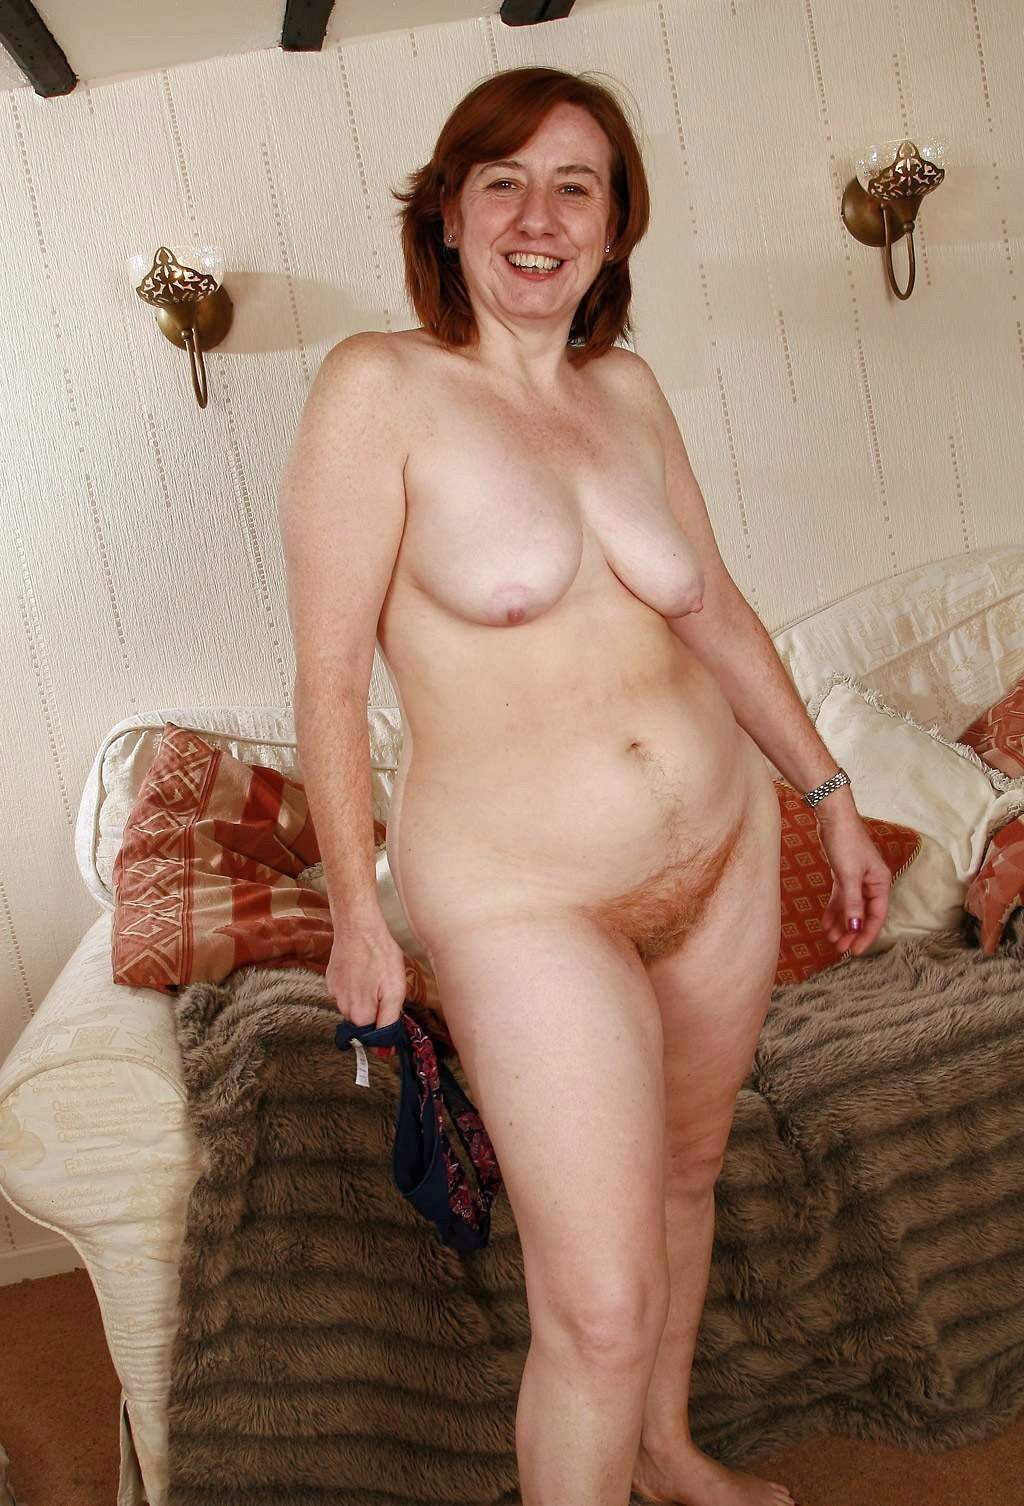 hot nude asian girl swimming